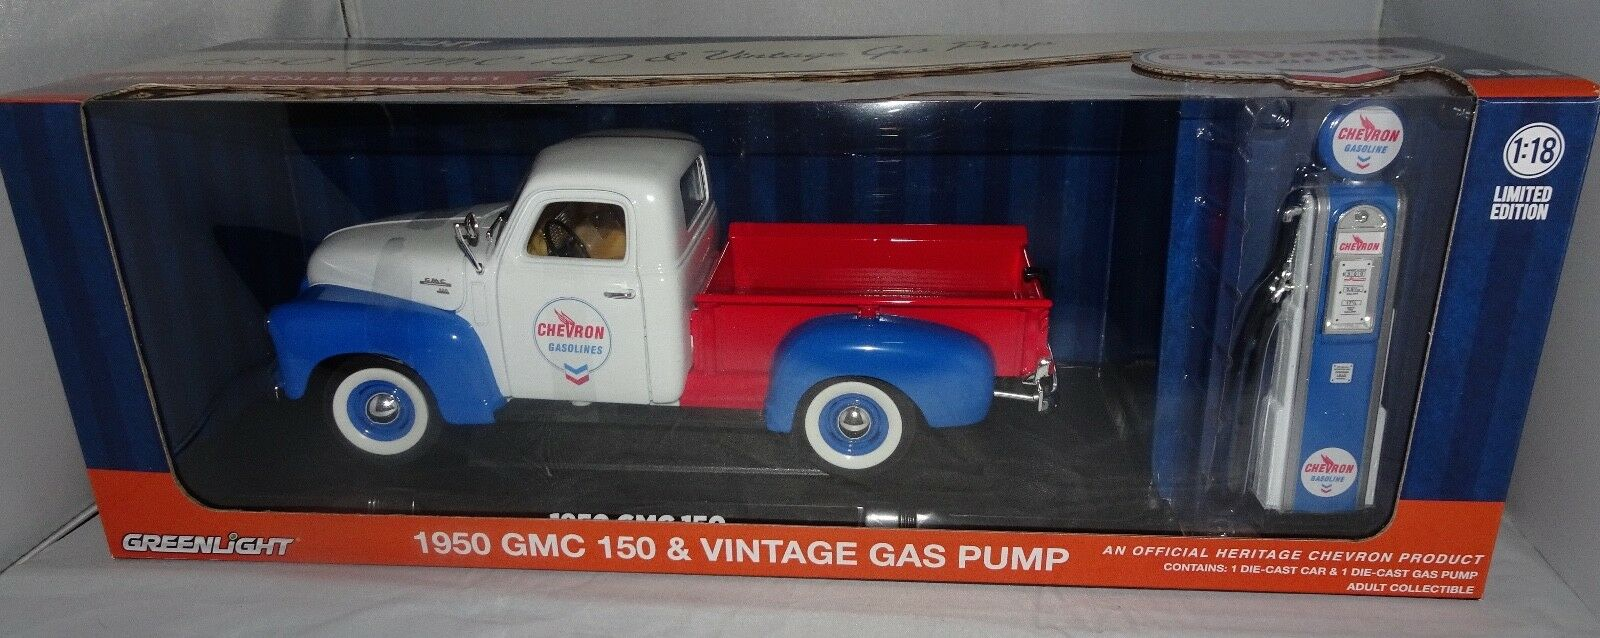 GREENLIGHT 1 18 1950 GMC 150 CHEVRON VINTAGE CHEVRON GAS PUMP DIECAST CAR